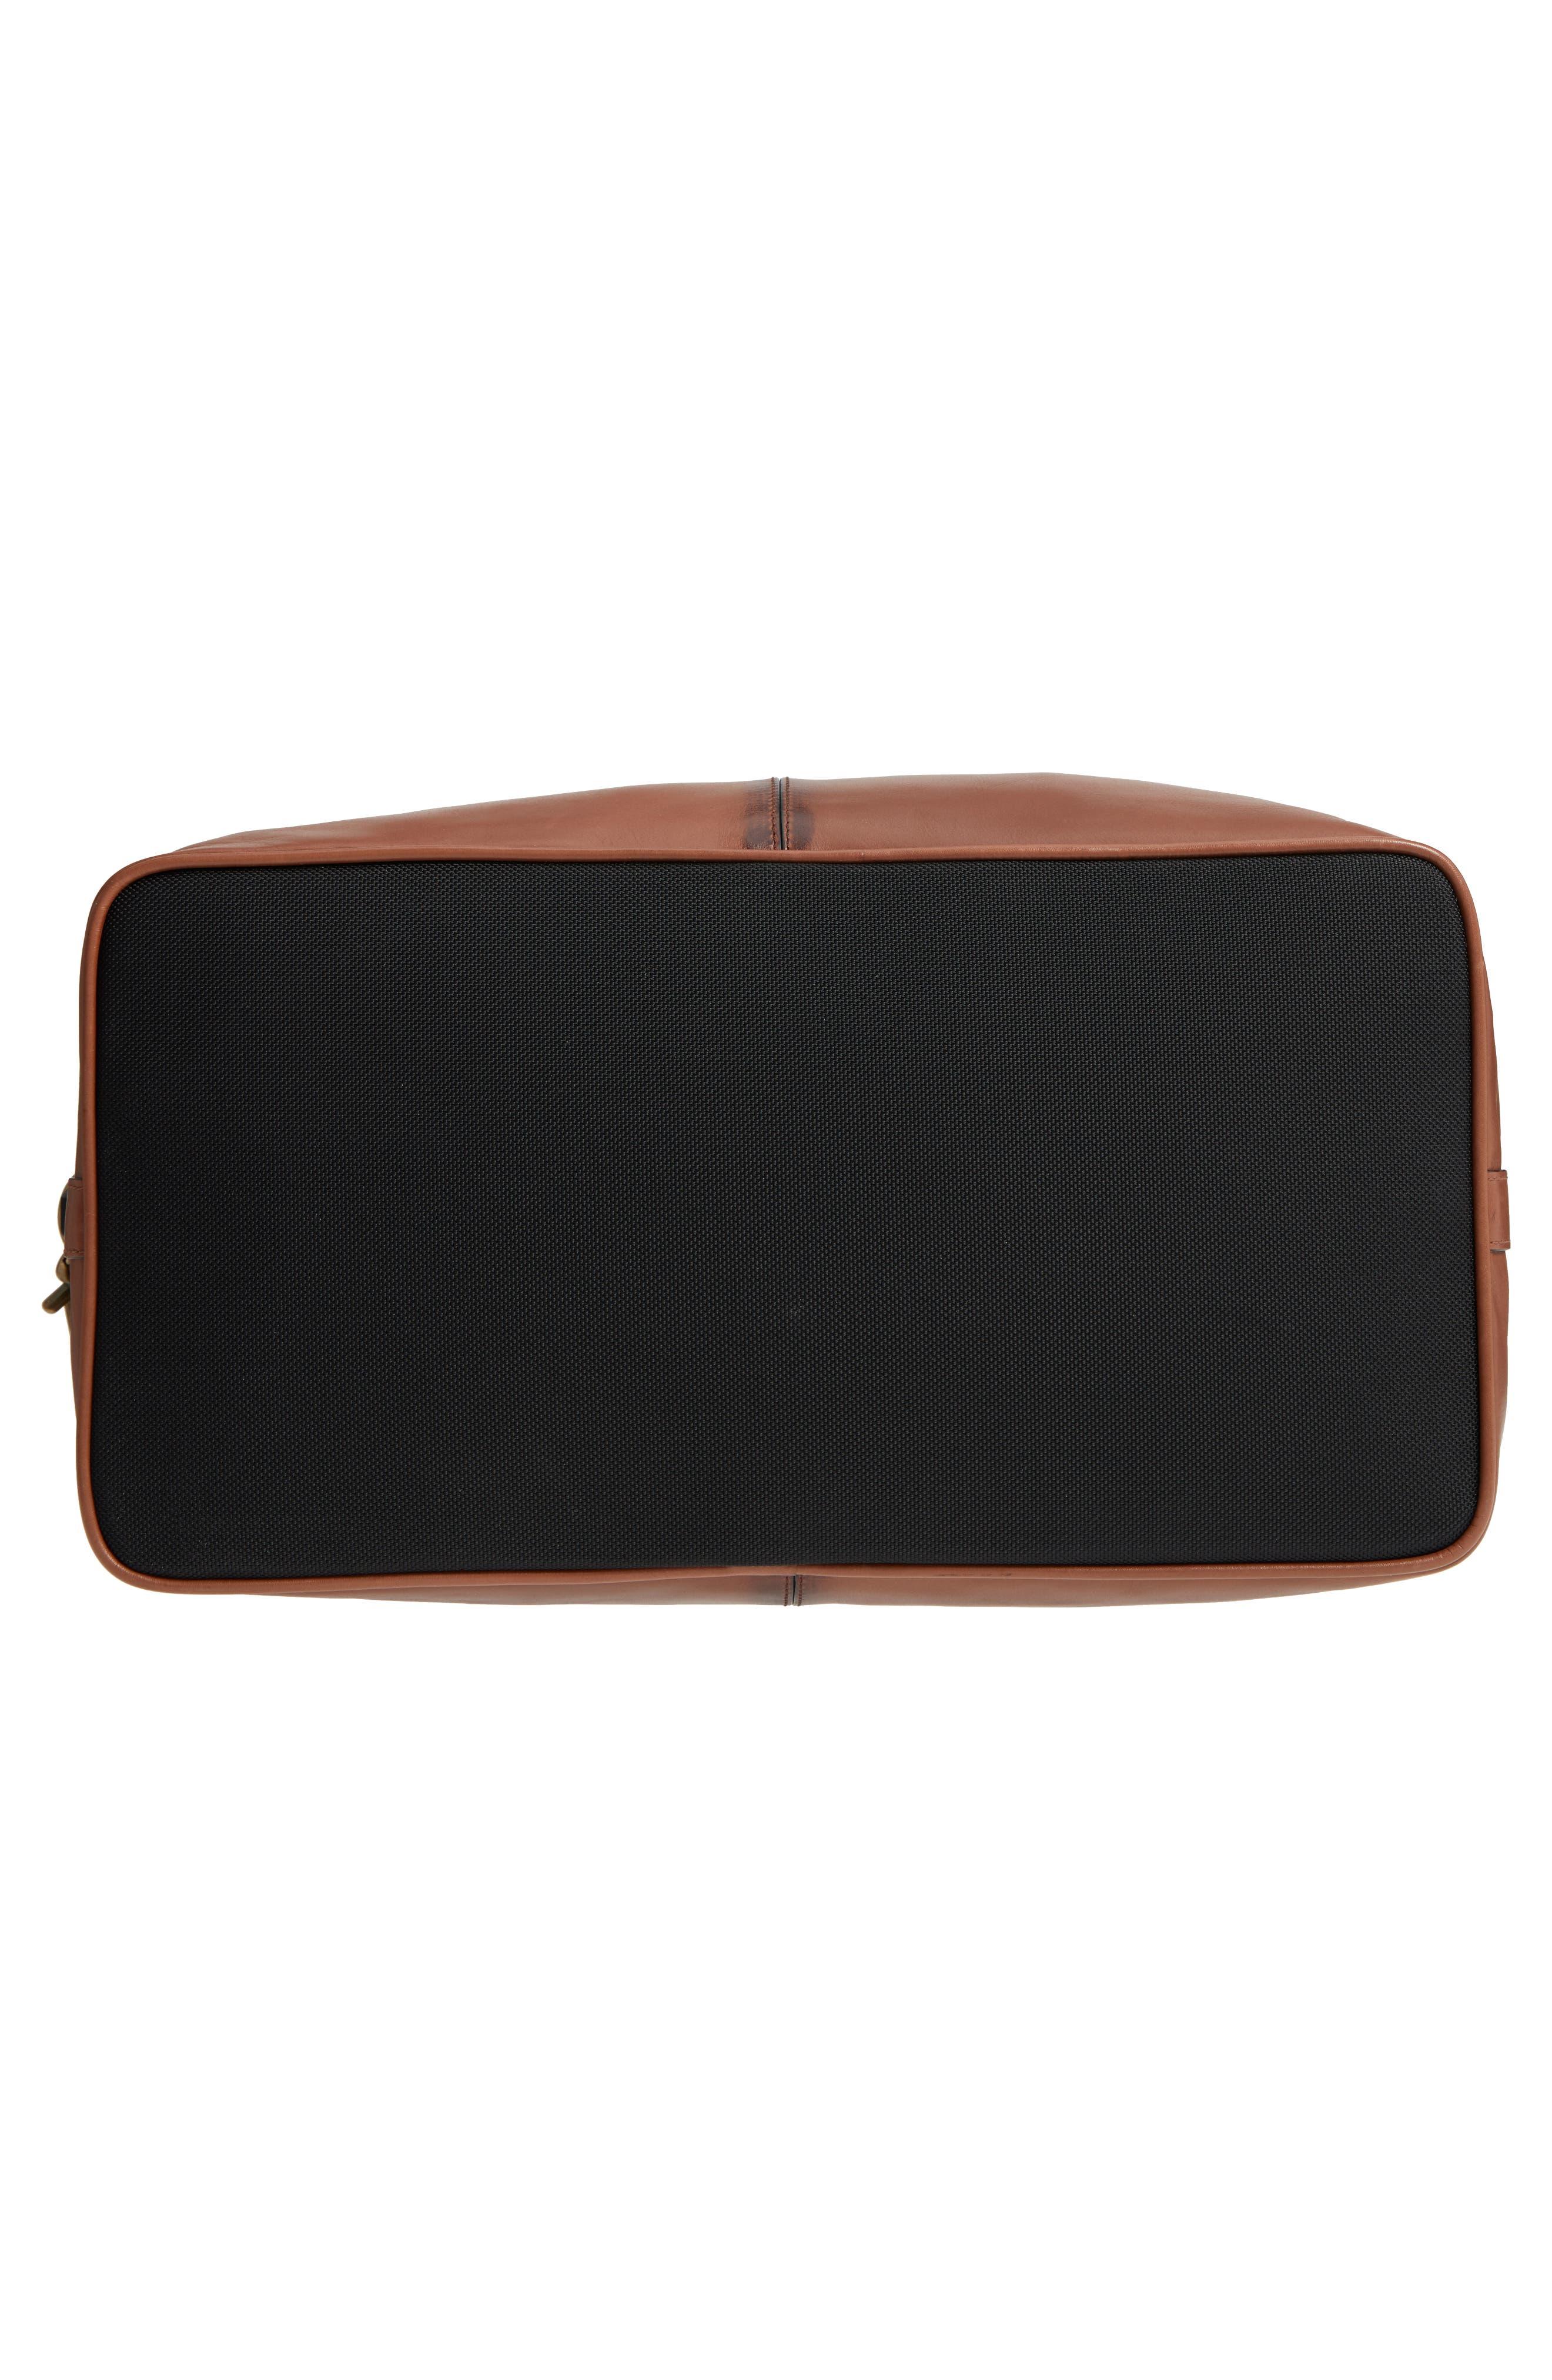 Heritage Leather Duffel Bag,                             Alternate thumbnail 6, color,                             200